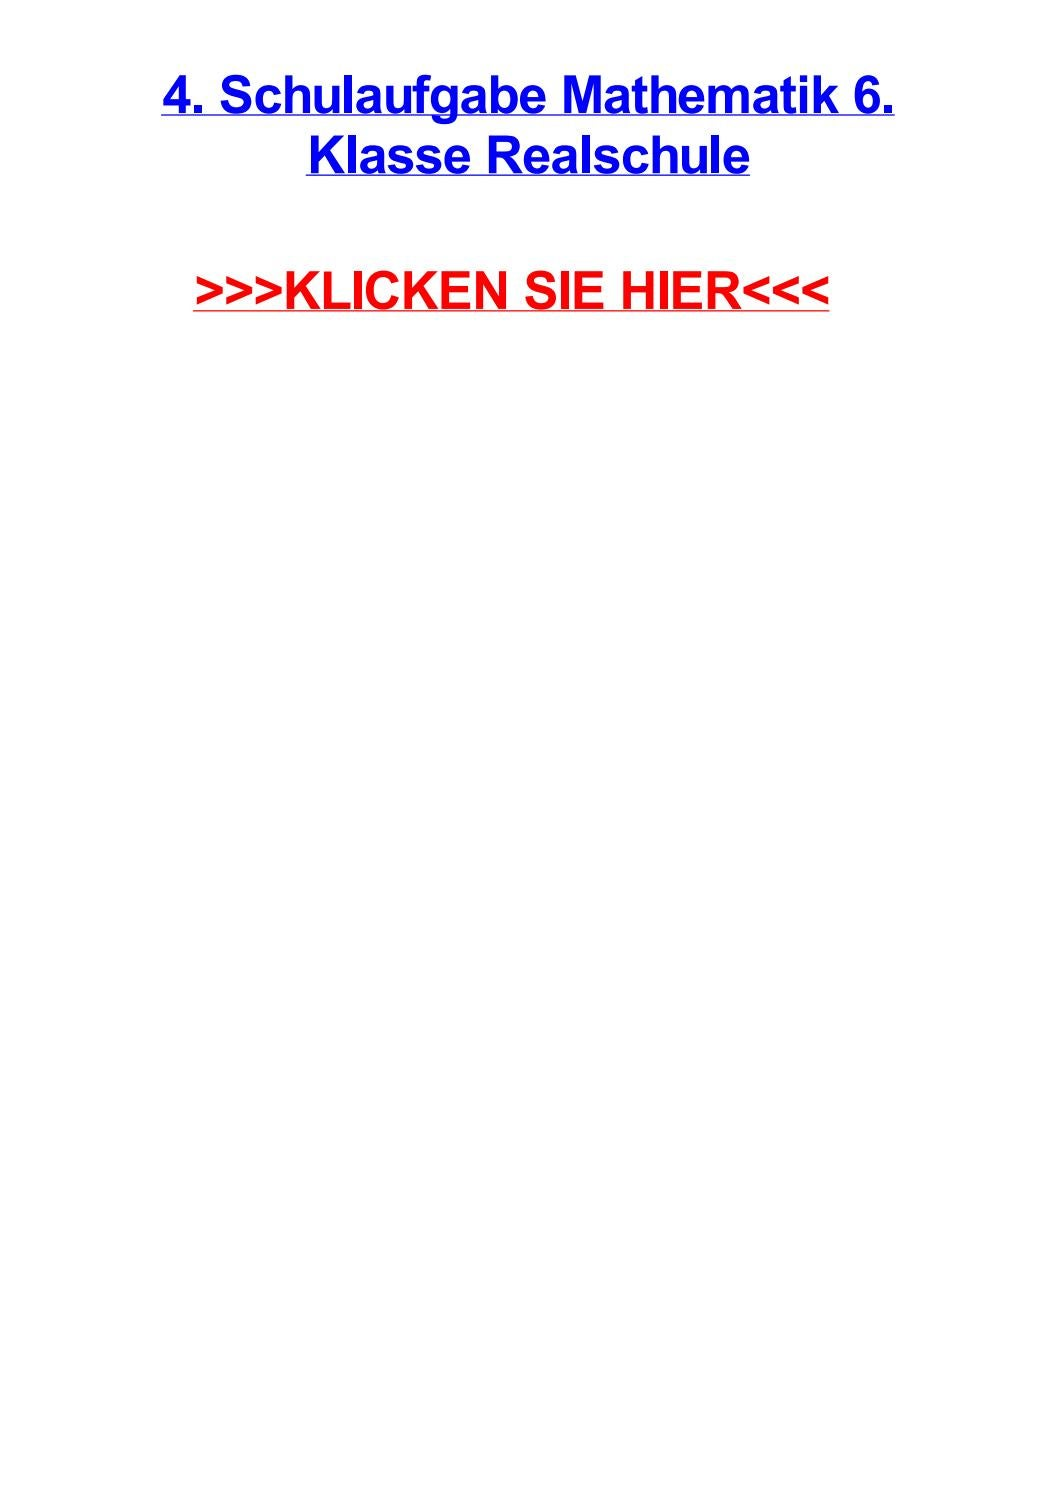 Großzügig Saxon Mathe Klasse 2 Arbeitsblatt Bilder - Gemischte ...